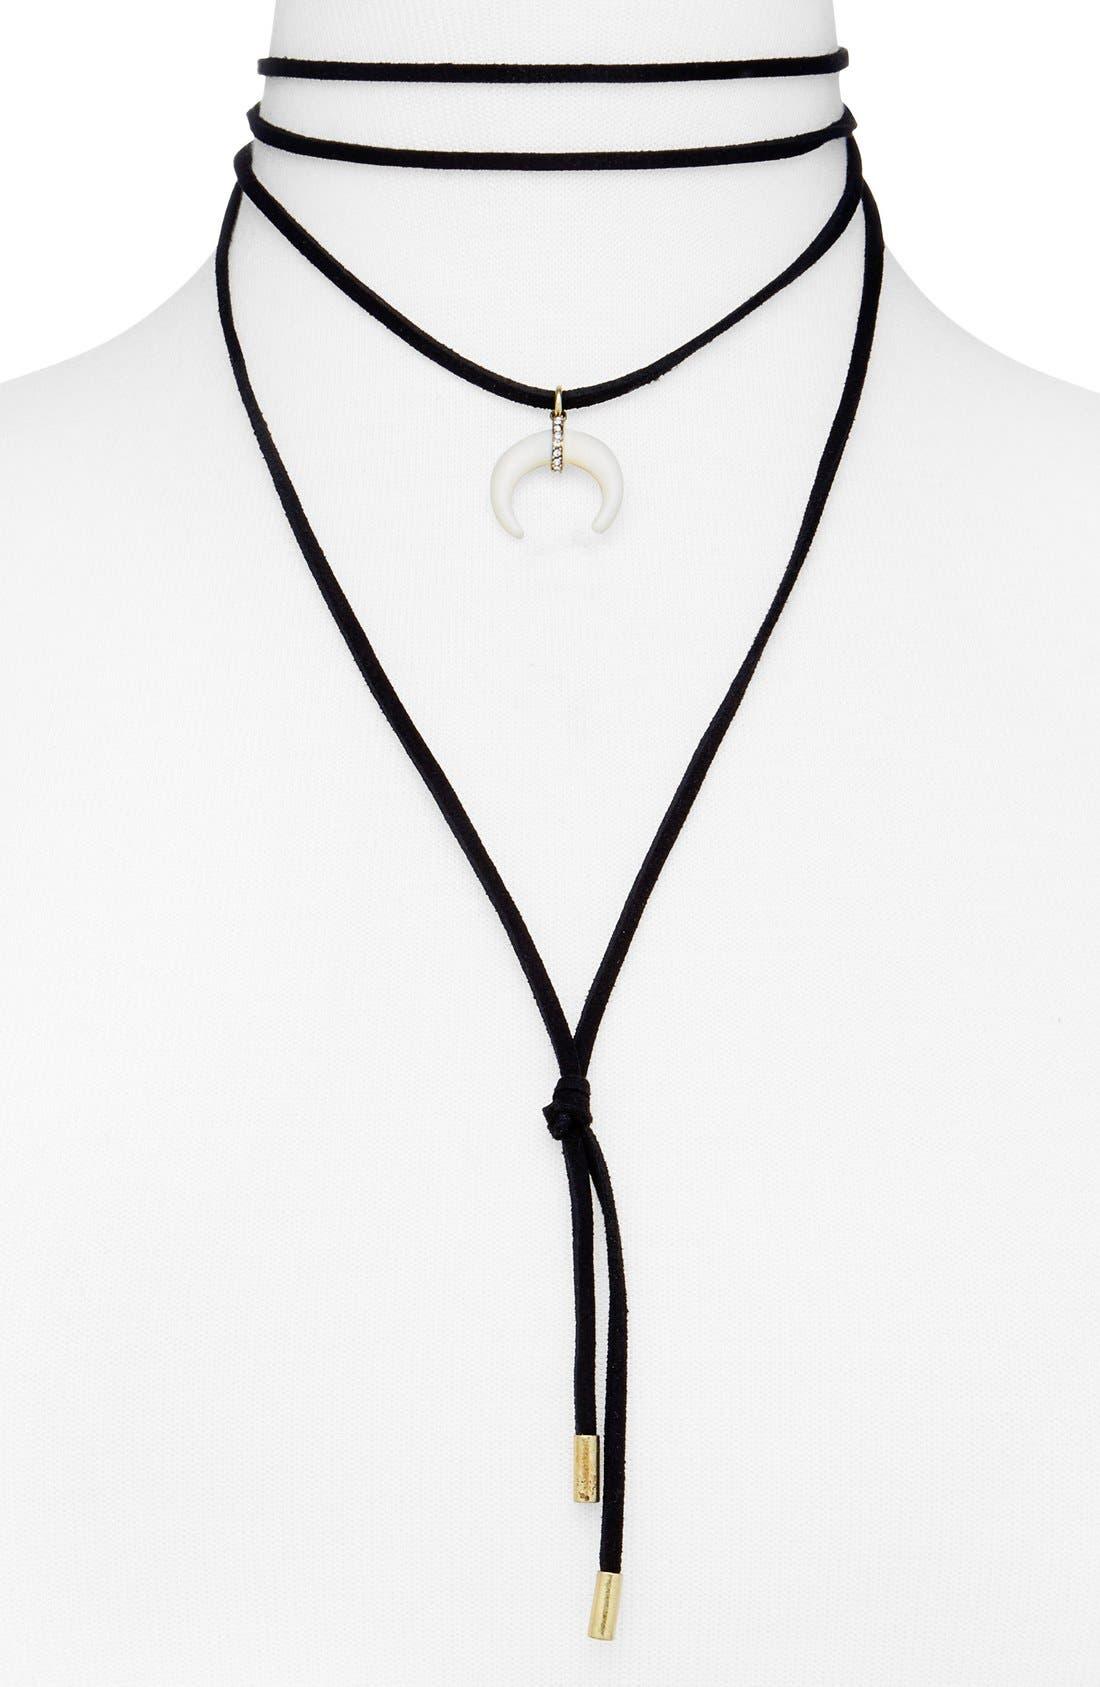 Alternate Image 1 Selected - BaubleBar Moana Lariat Choker Necklace